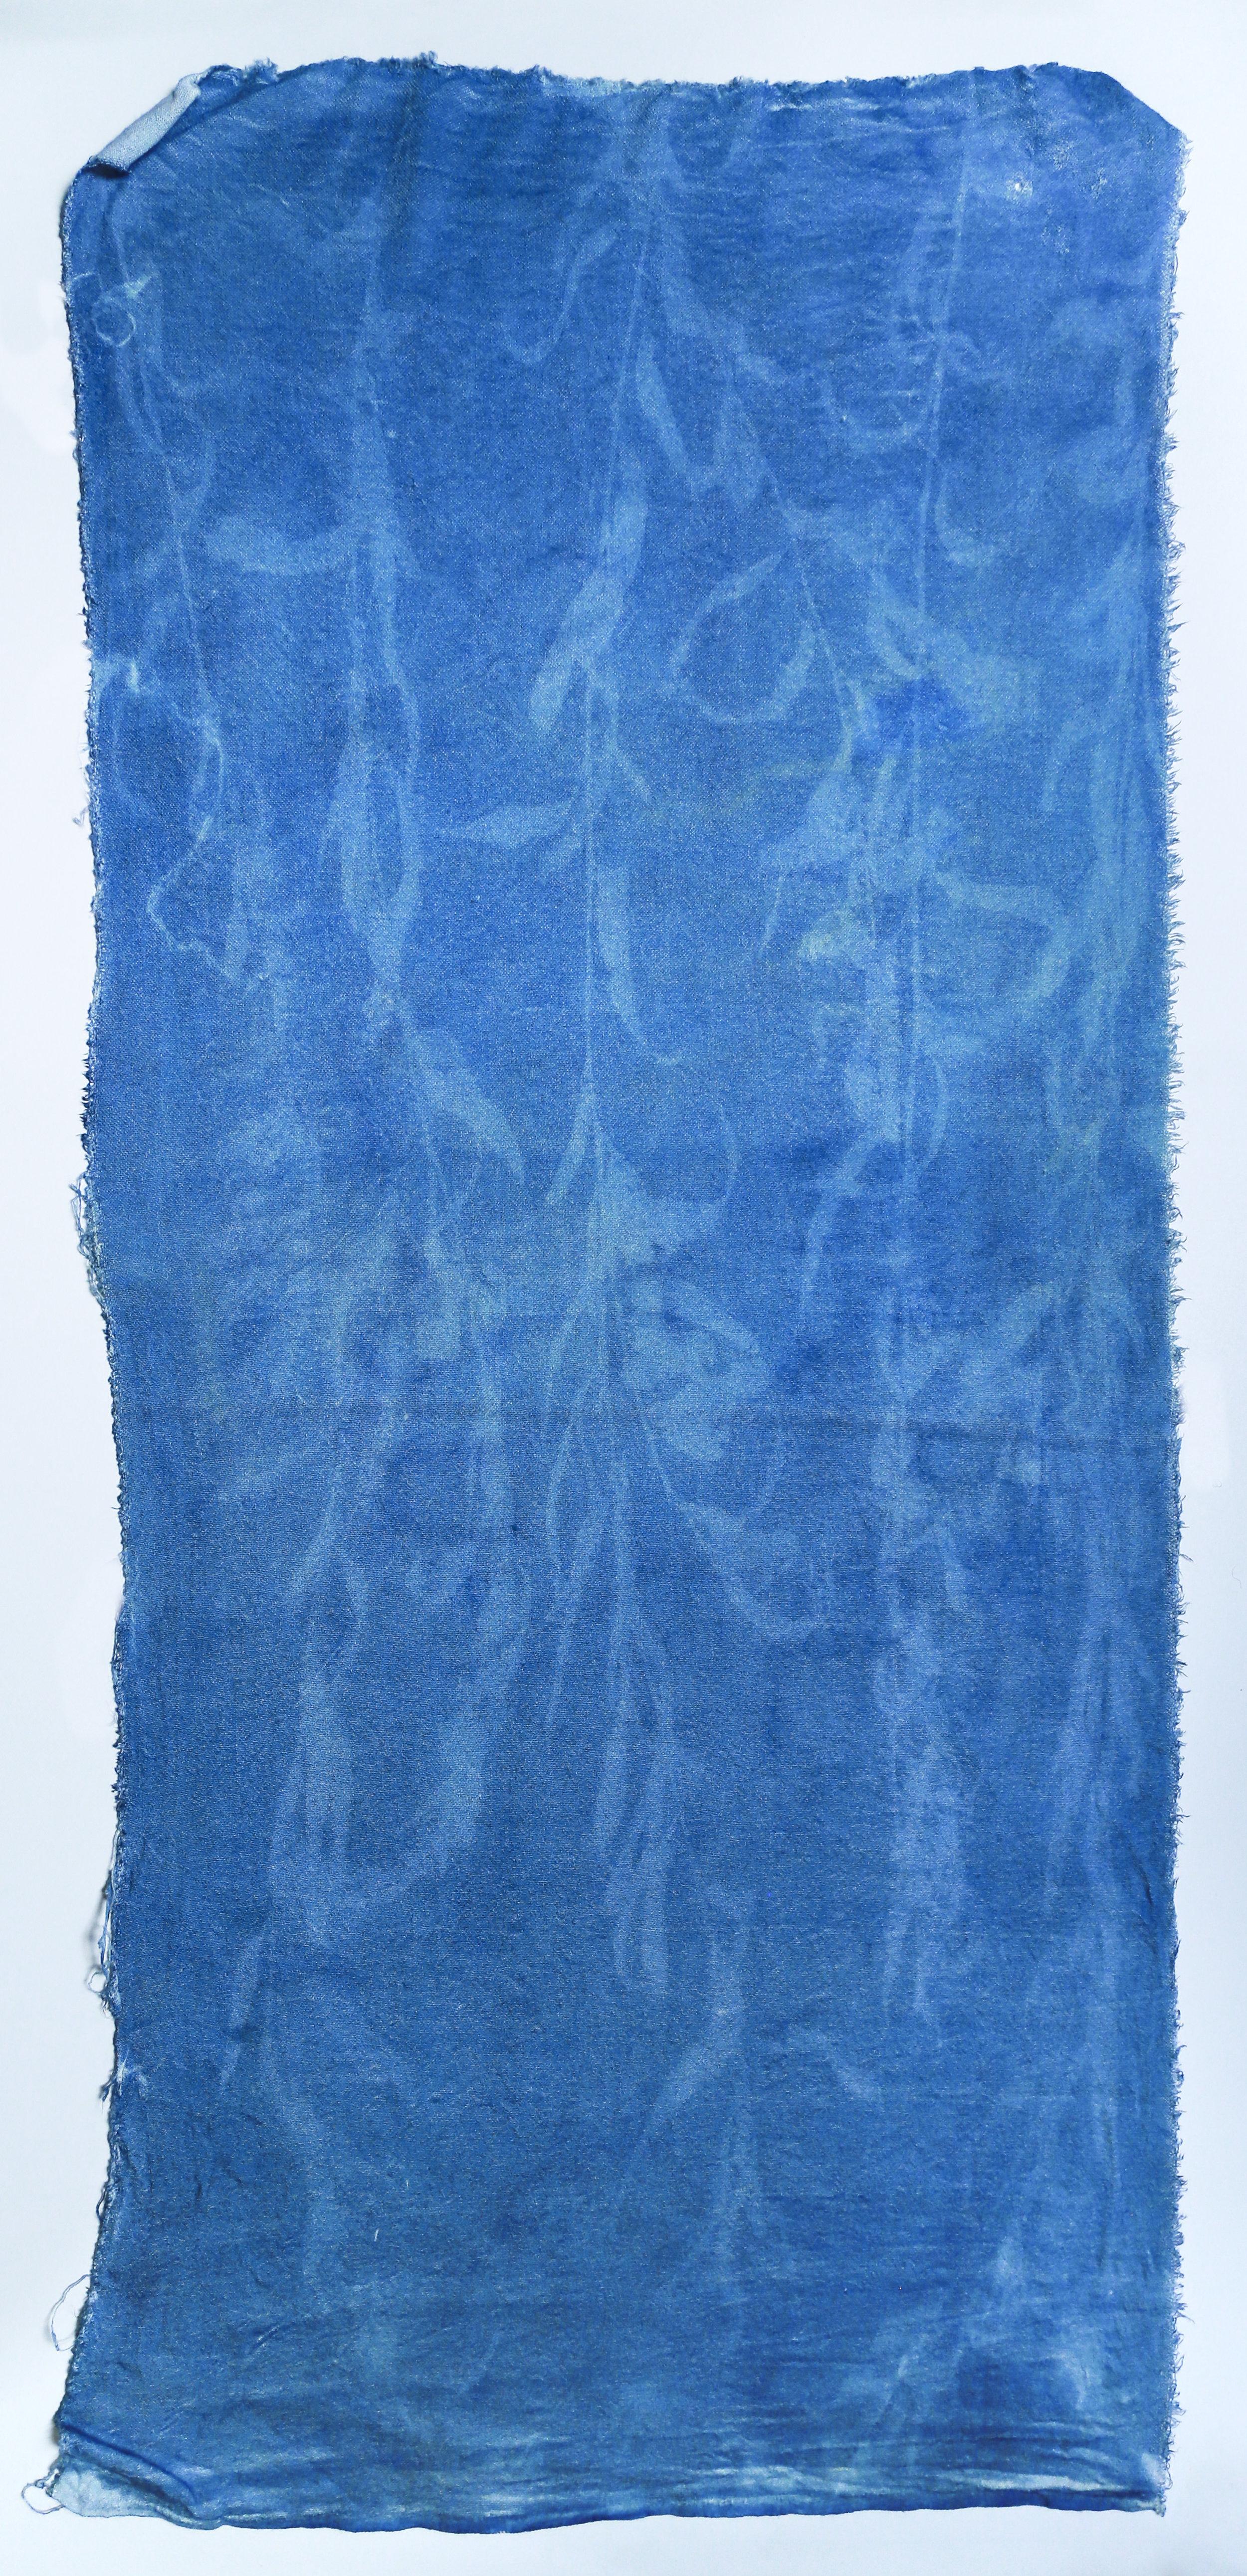 Saule Pleureur on linen wool blend V